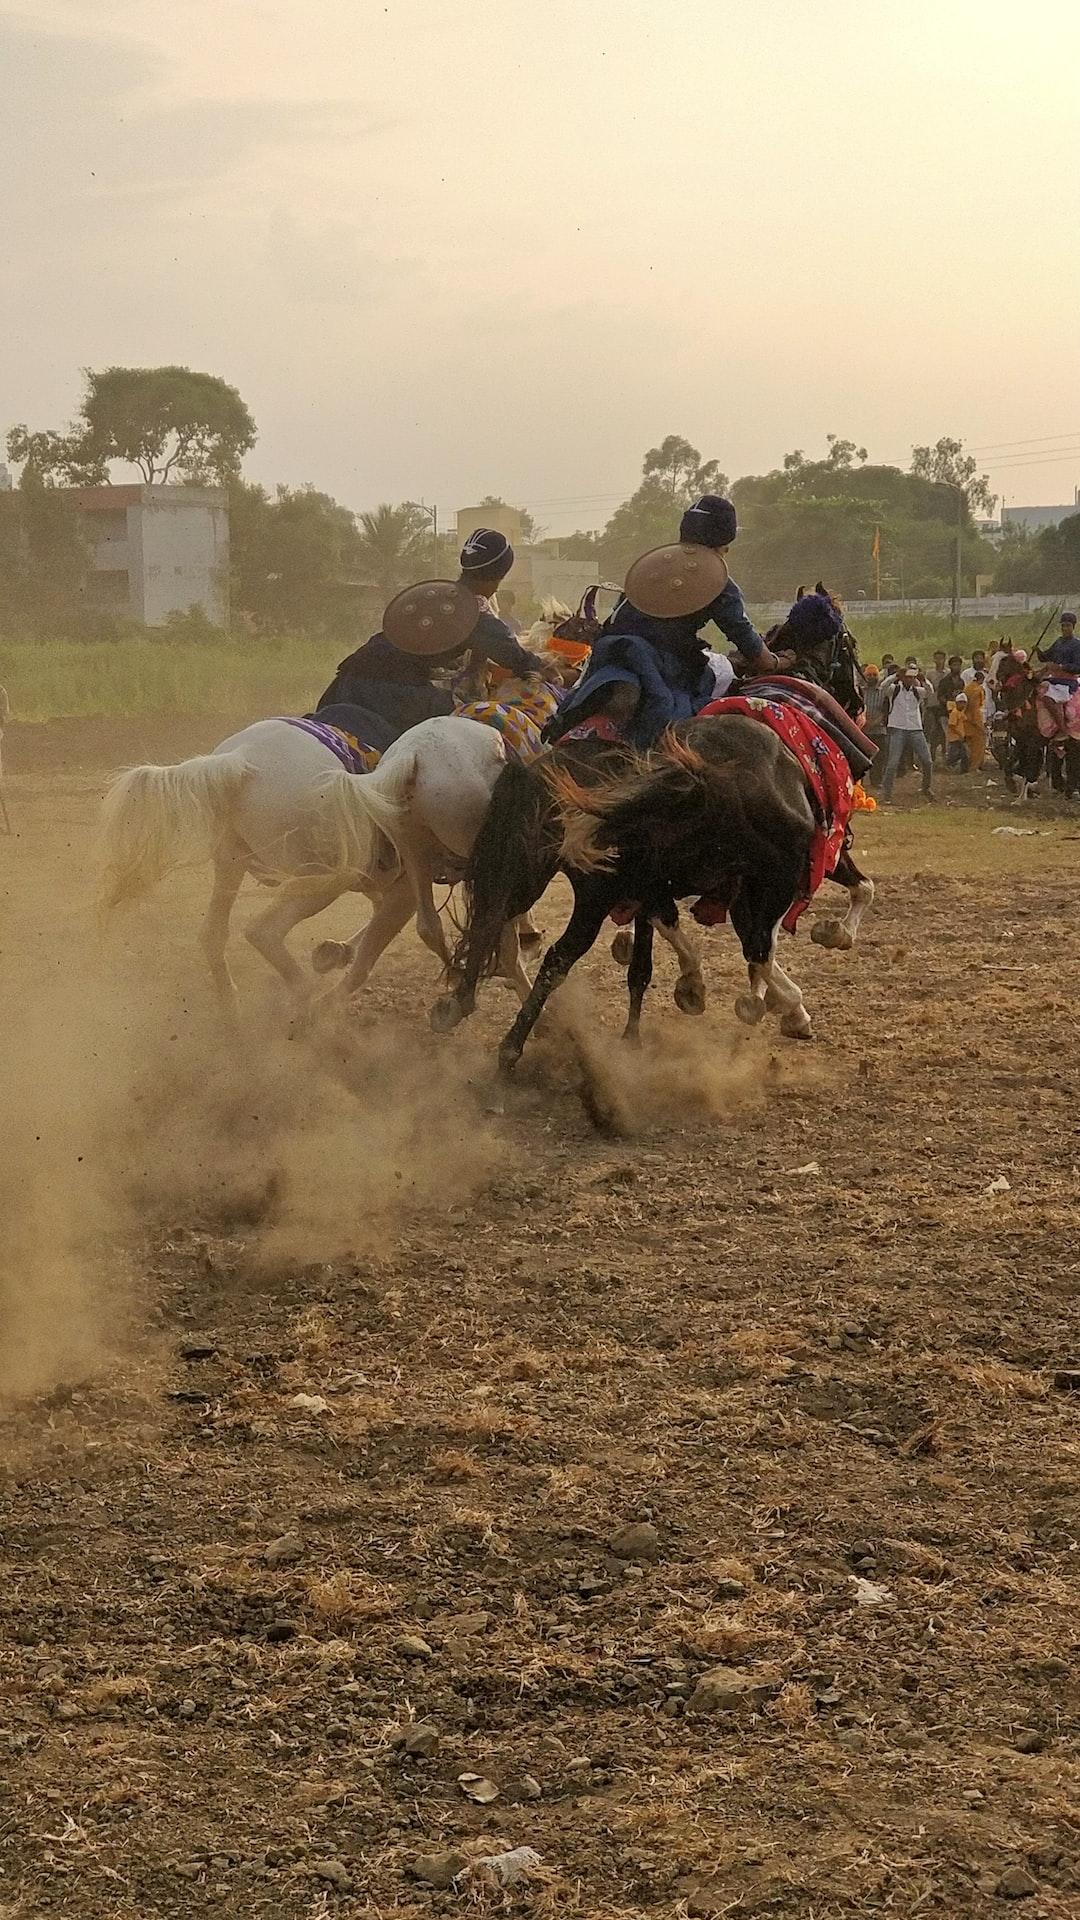 Two Nihang riders riding on three horses at hola mohala (holi) festival at Hazursahib, Nanded.